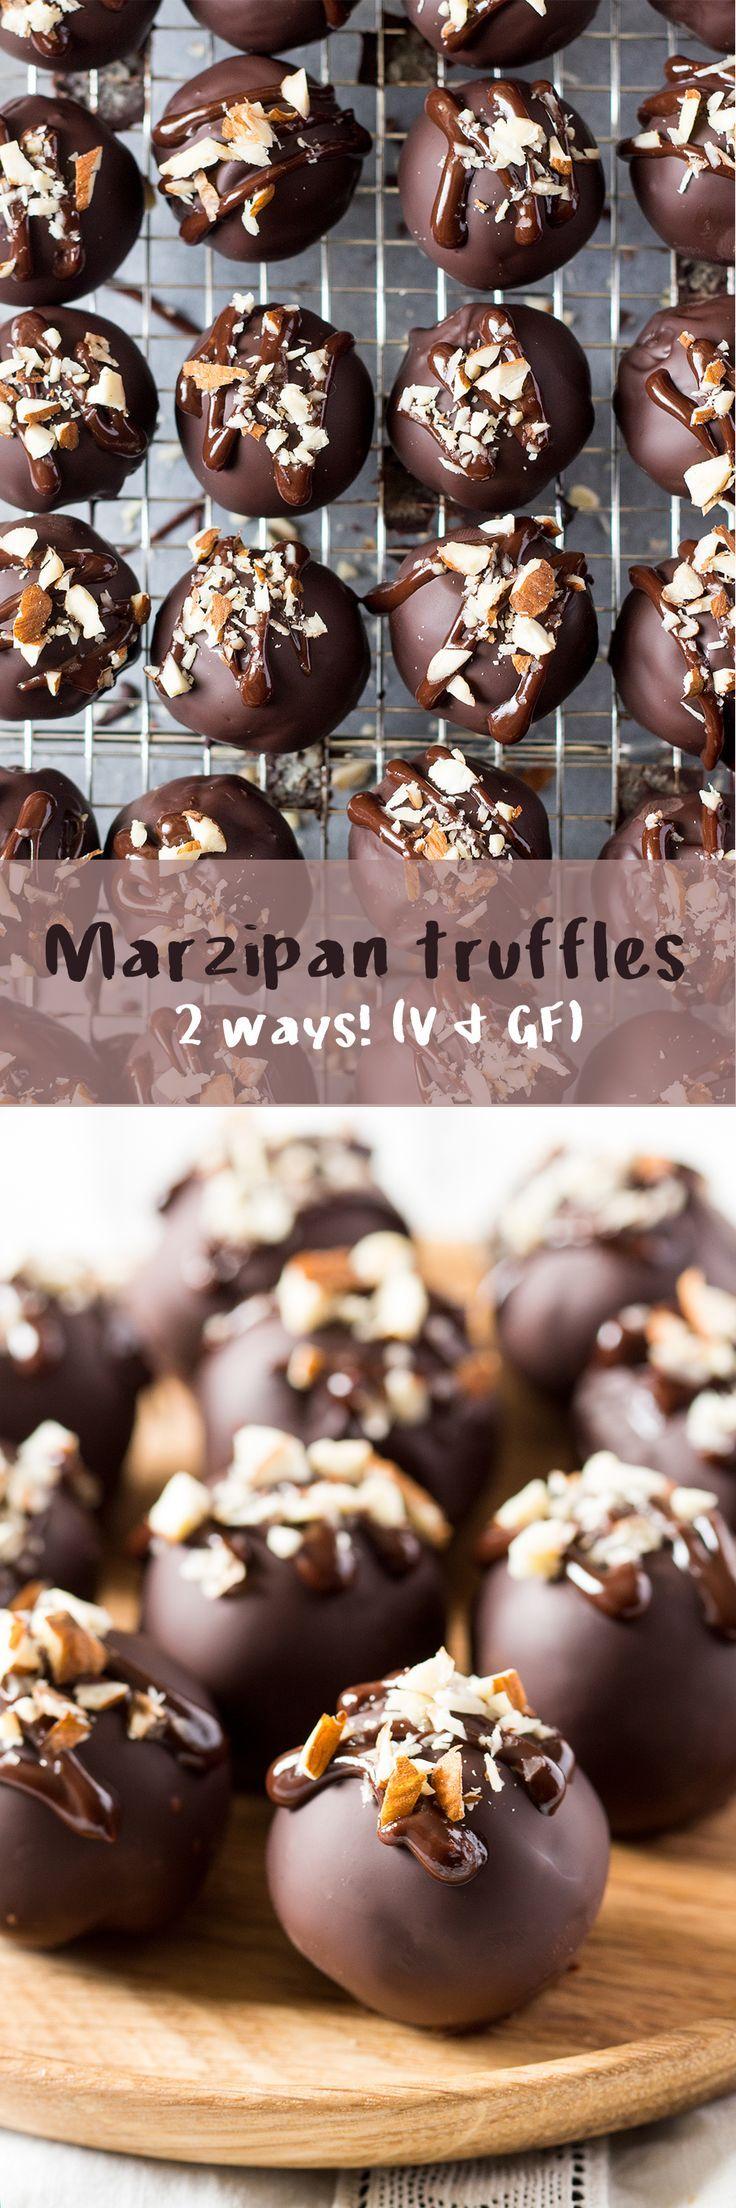 Vegan Marzipan Truffles